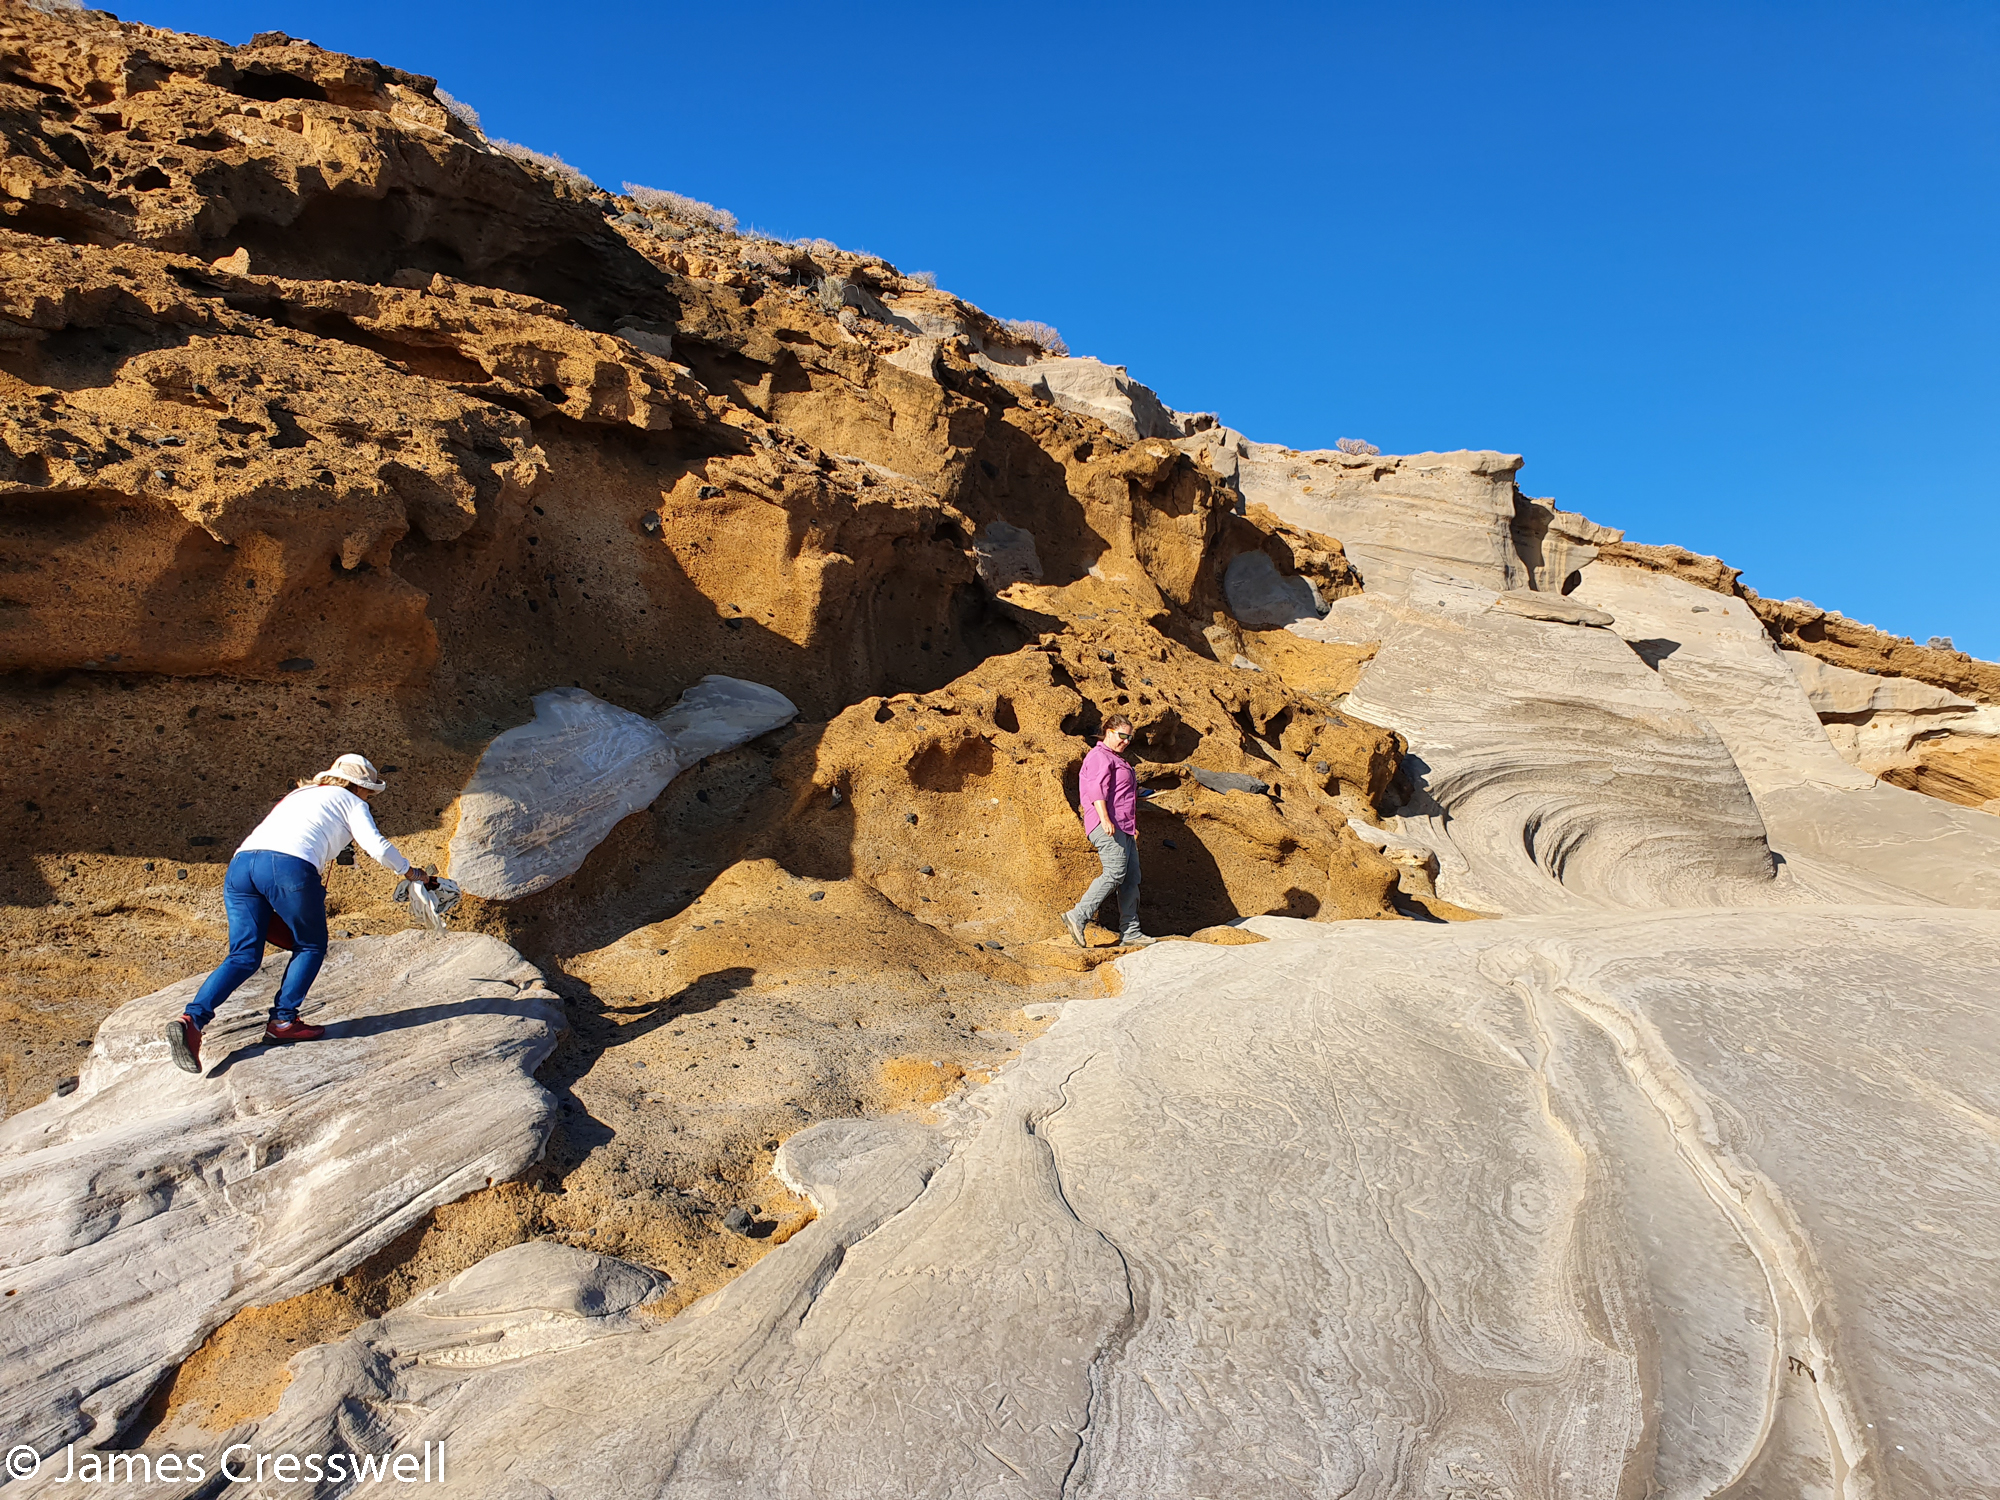 Two people walking across fossilised beach dunes